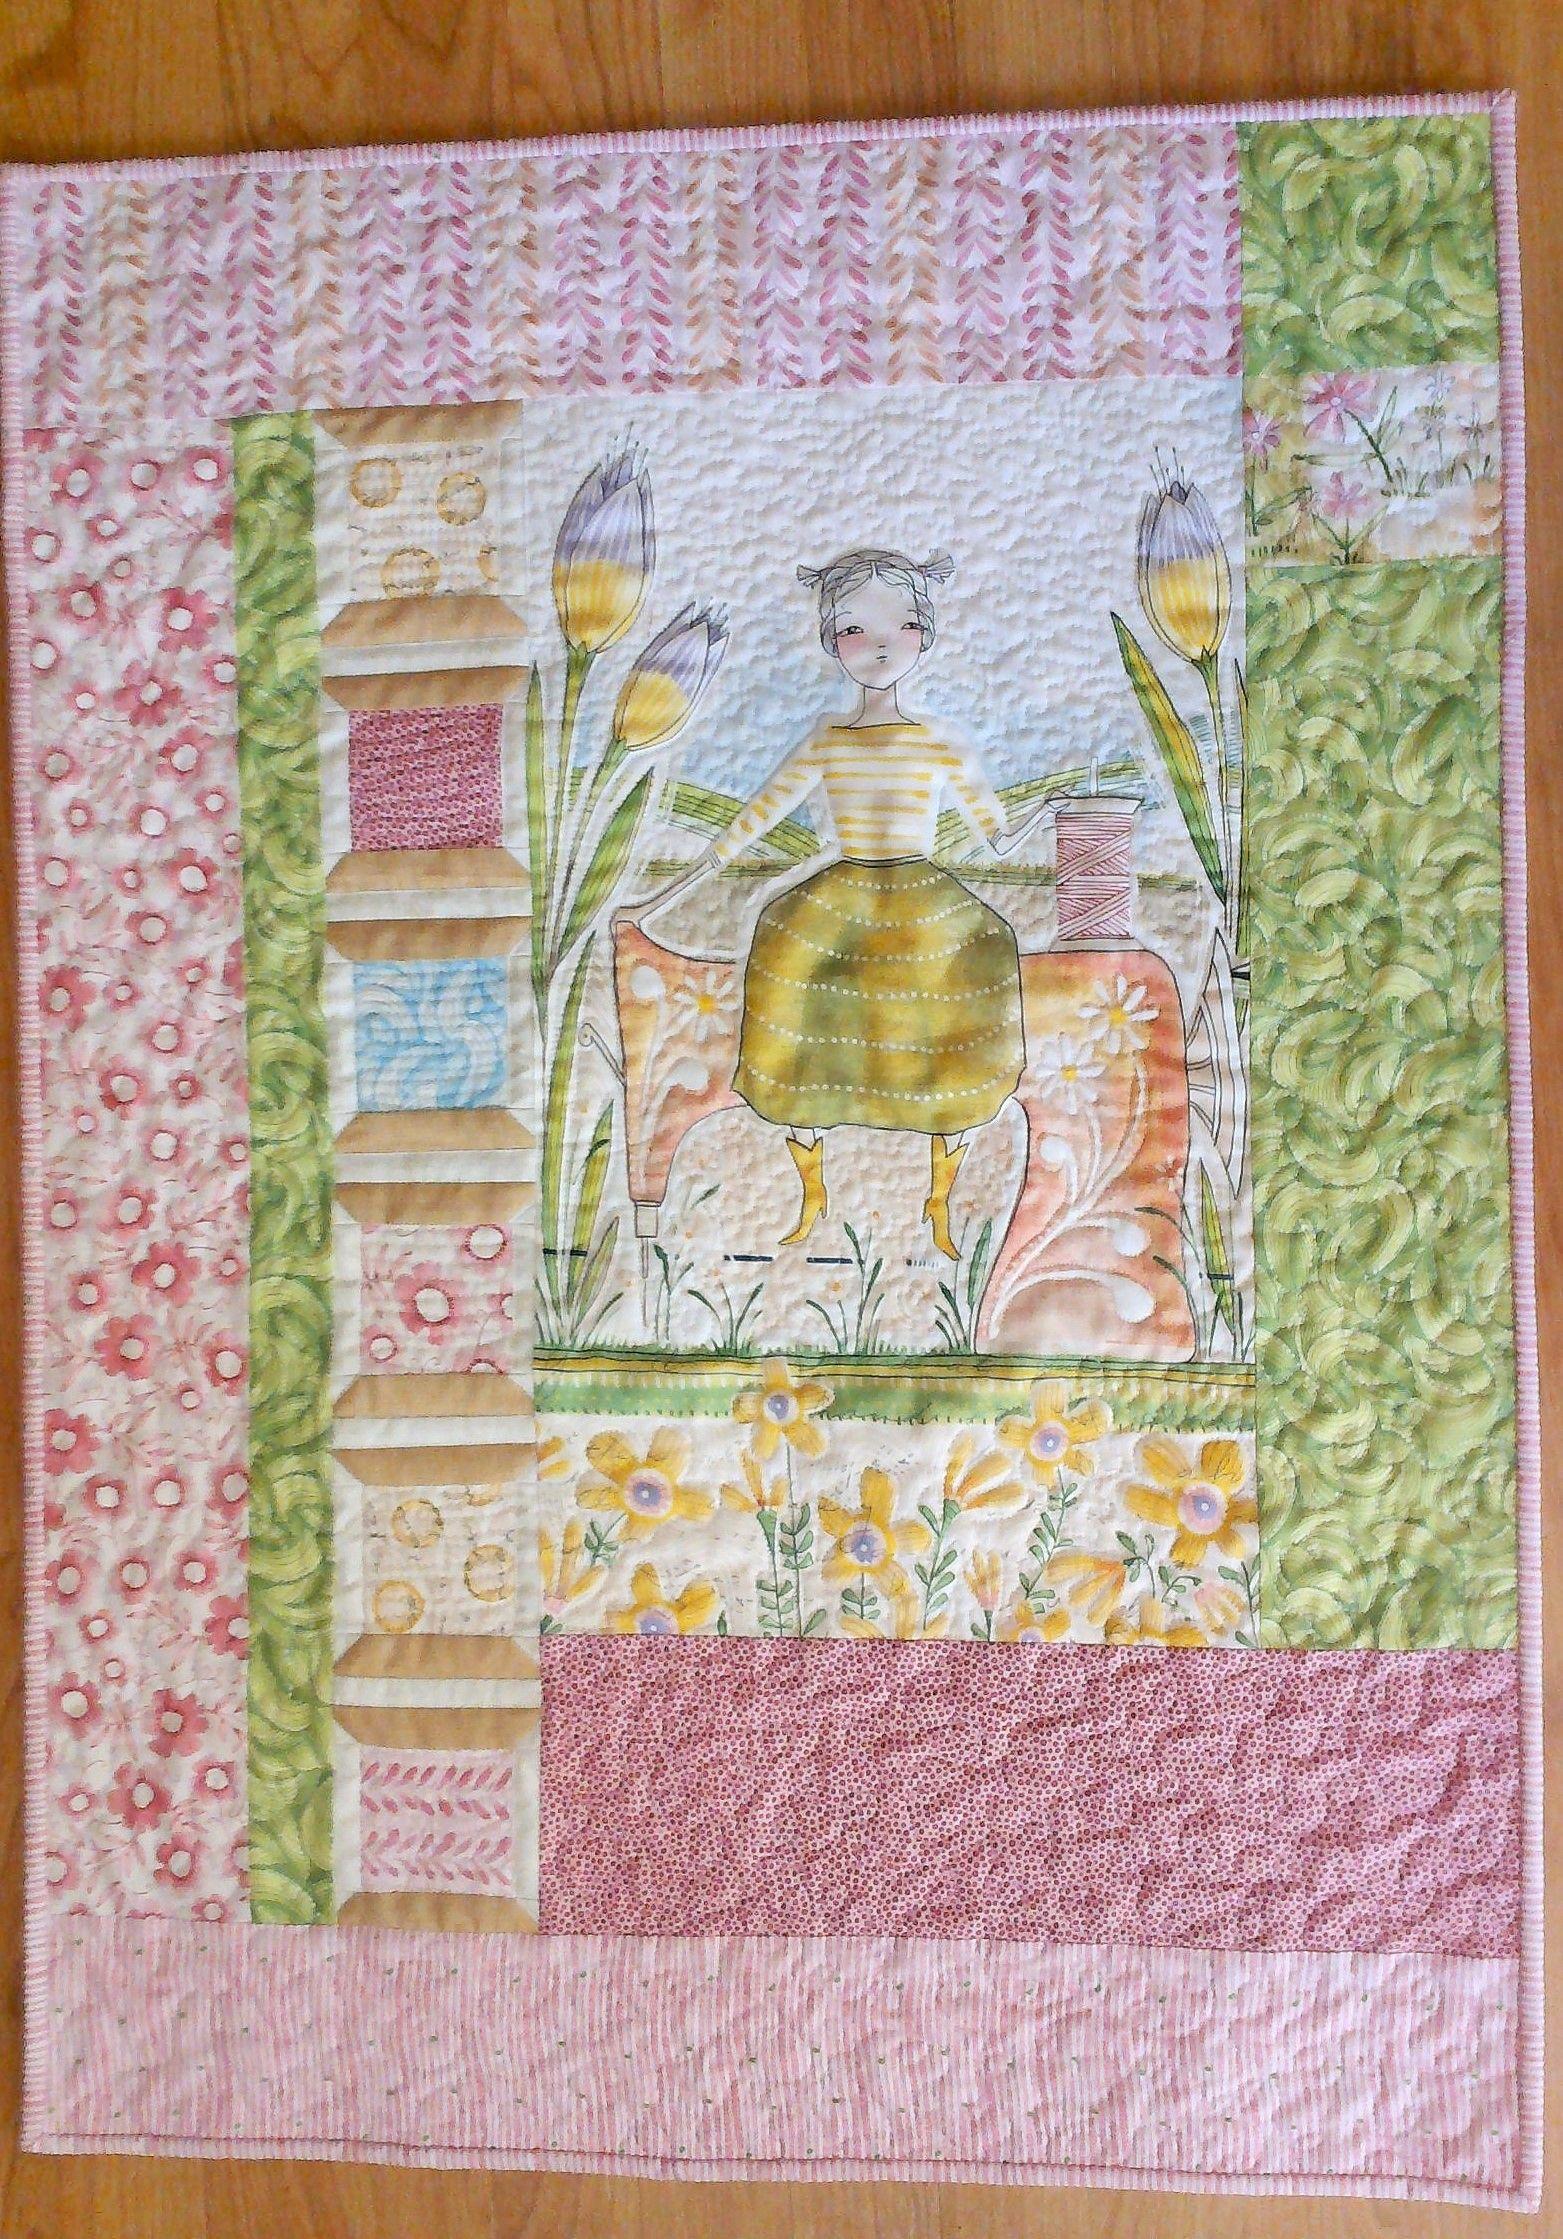 The Makers fabric by Cori Dantini An original pattern by Mary Carlock.